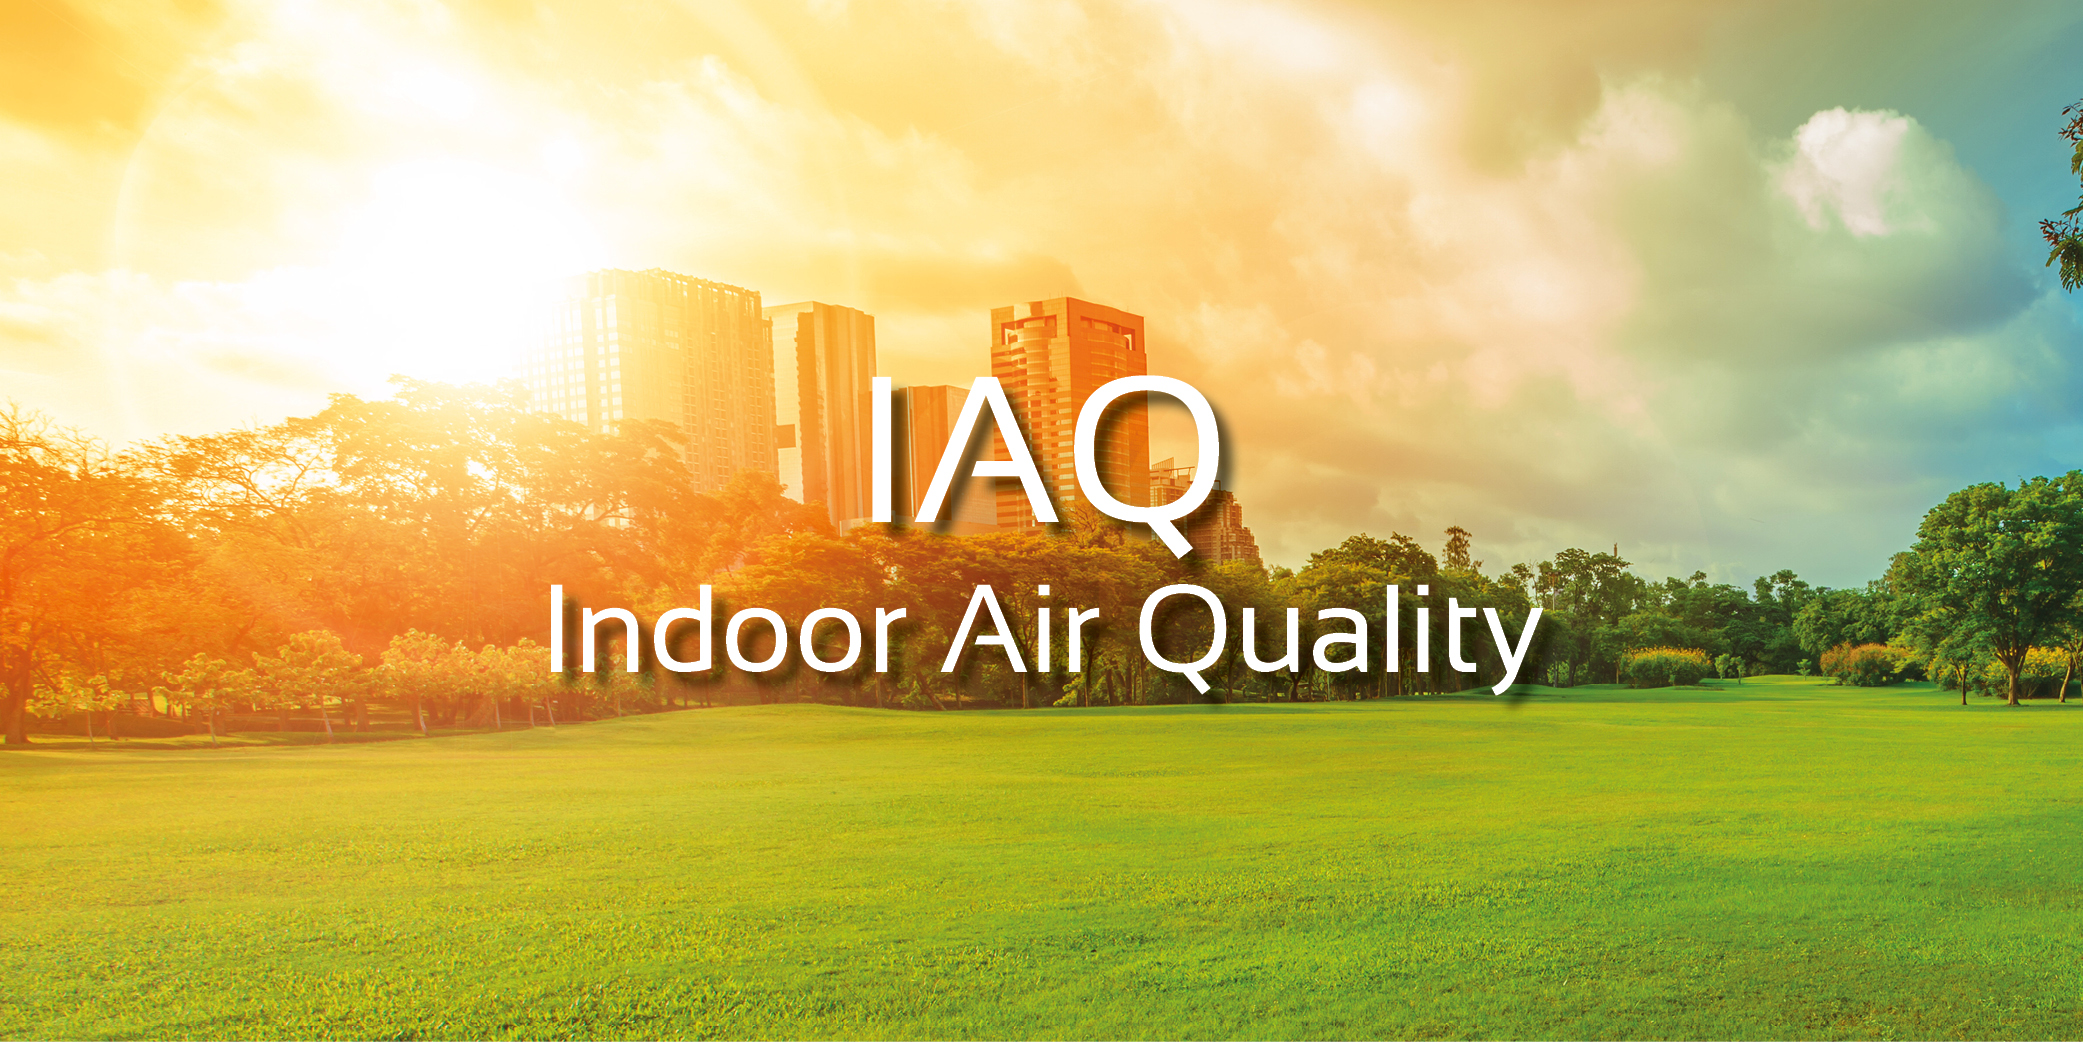 IAQ Indoor Air Quality